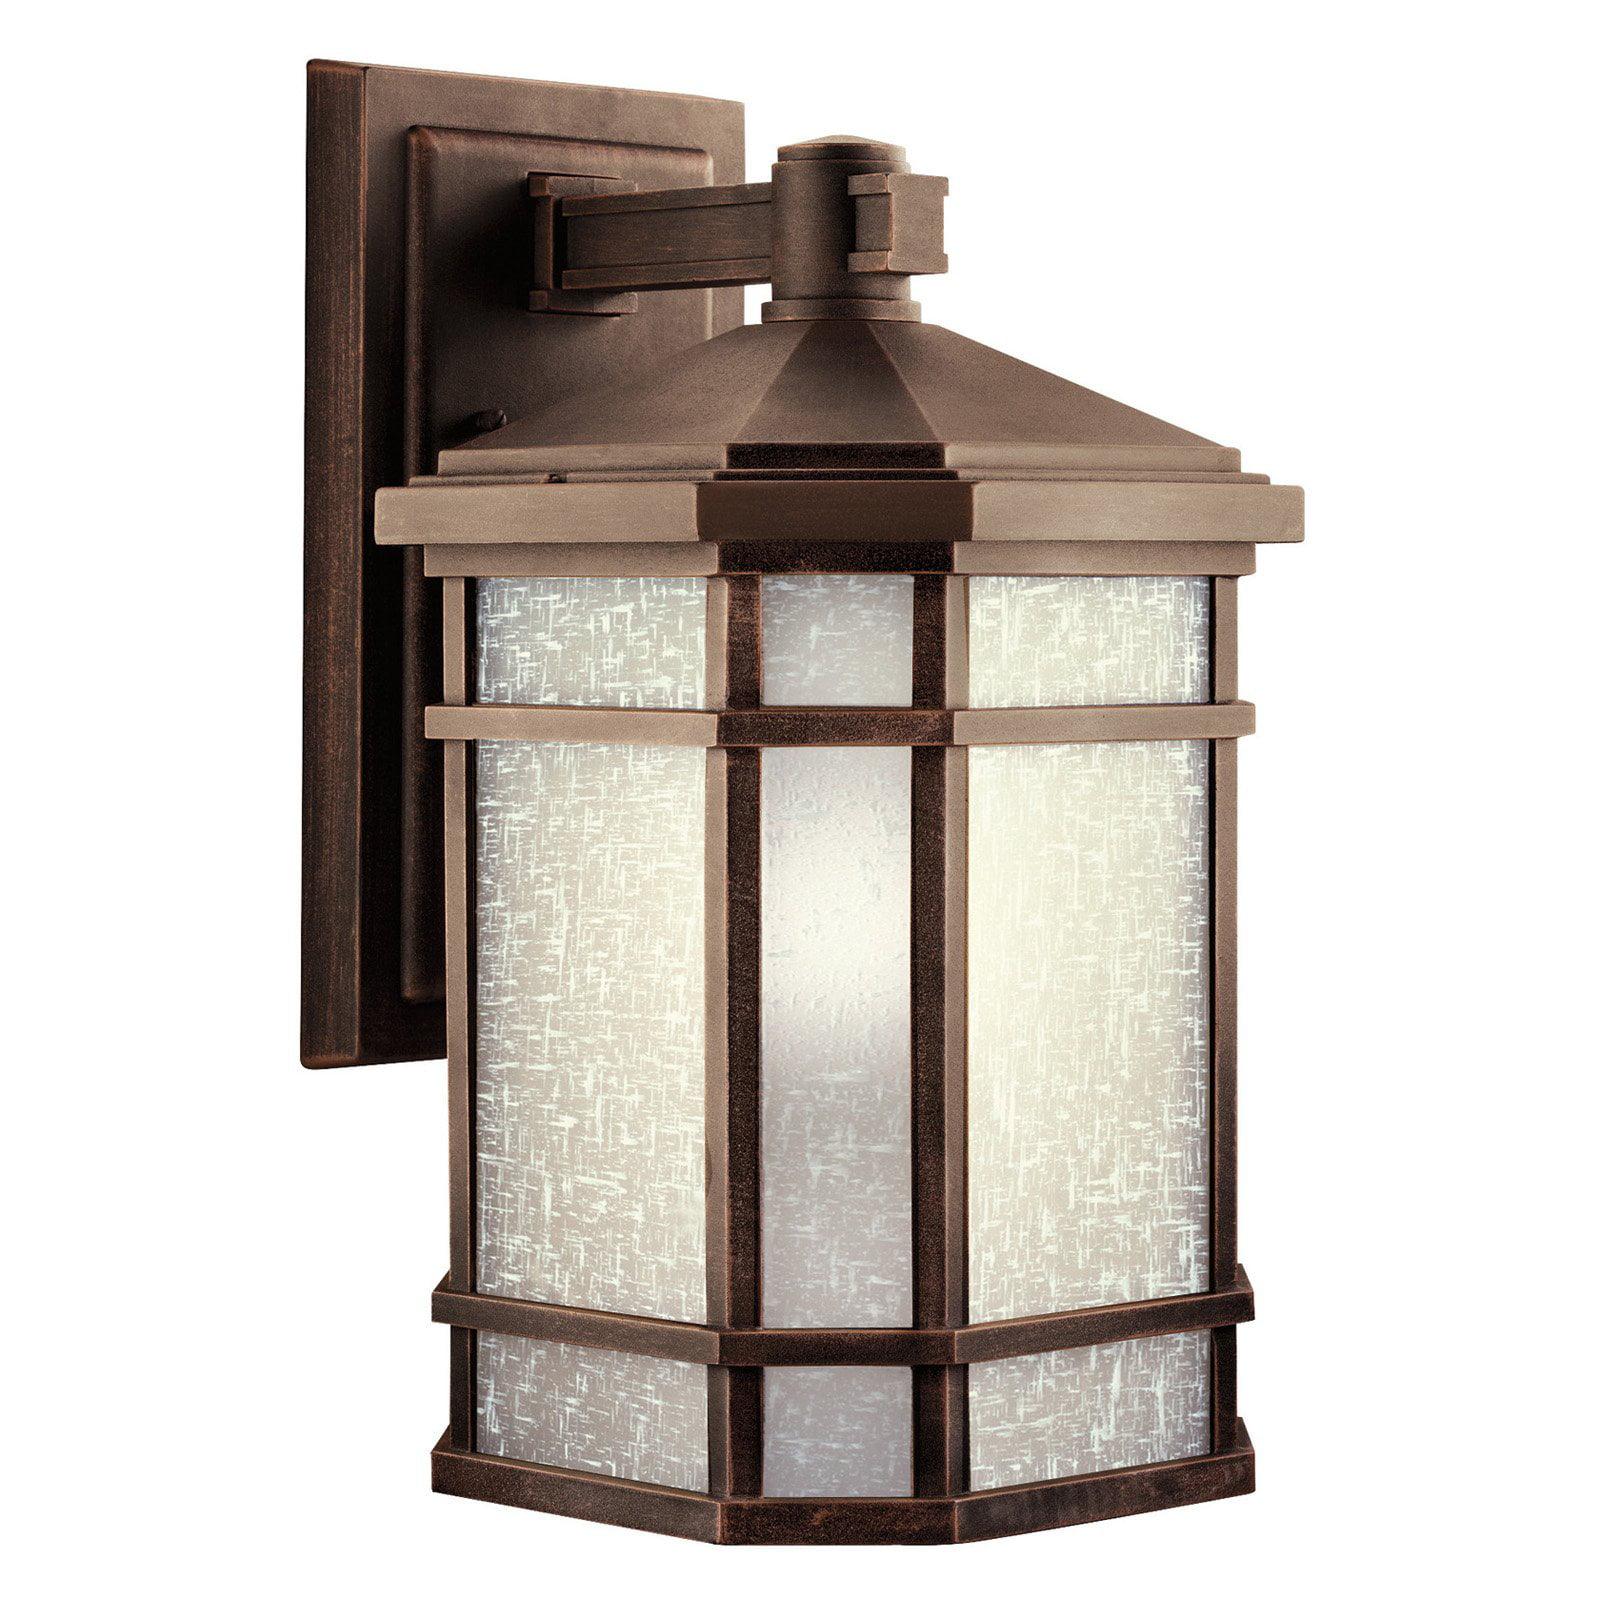 Kichler Cameron 1101 Outdoor Wall Lantern - Prairie Rock